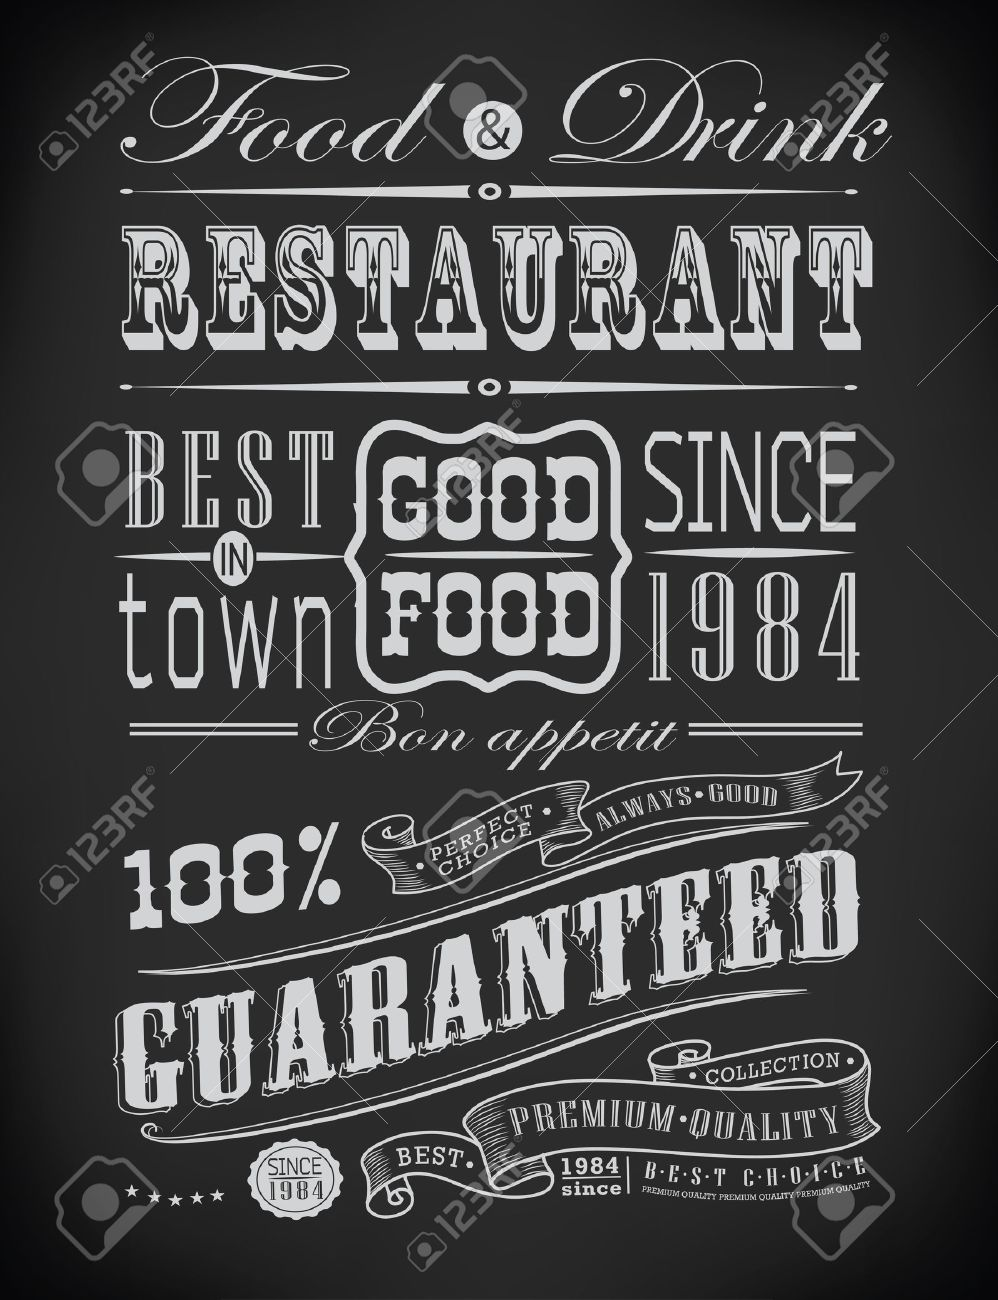 Set of Vintage Retro typographic restaurant elements/ decoration Stock Vector - 23474514